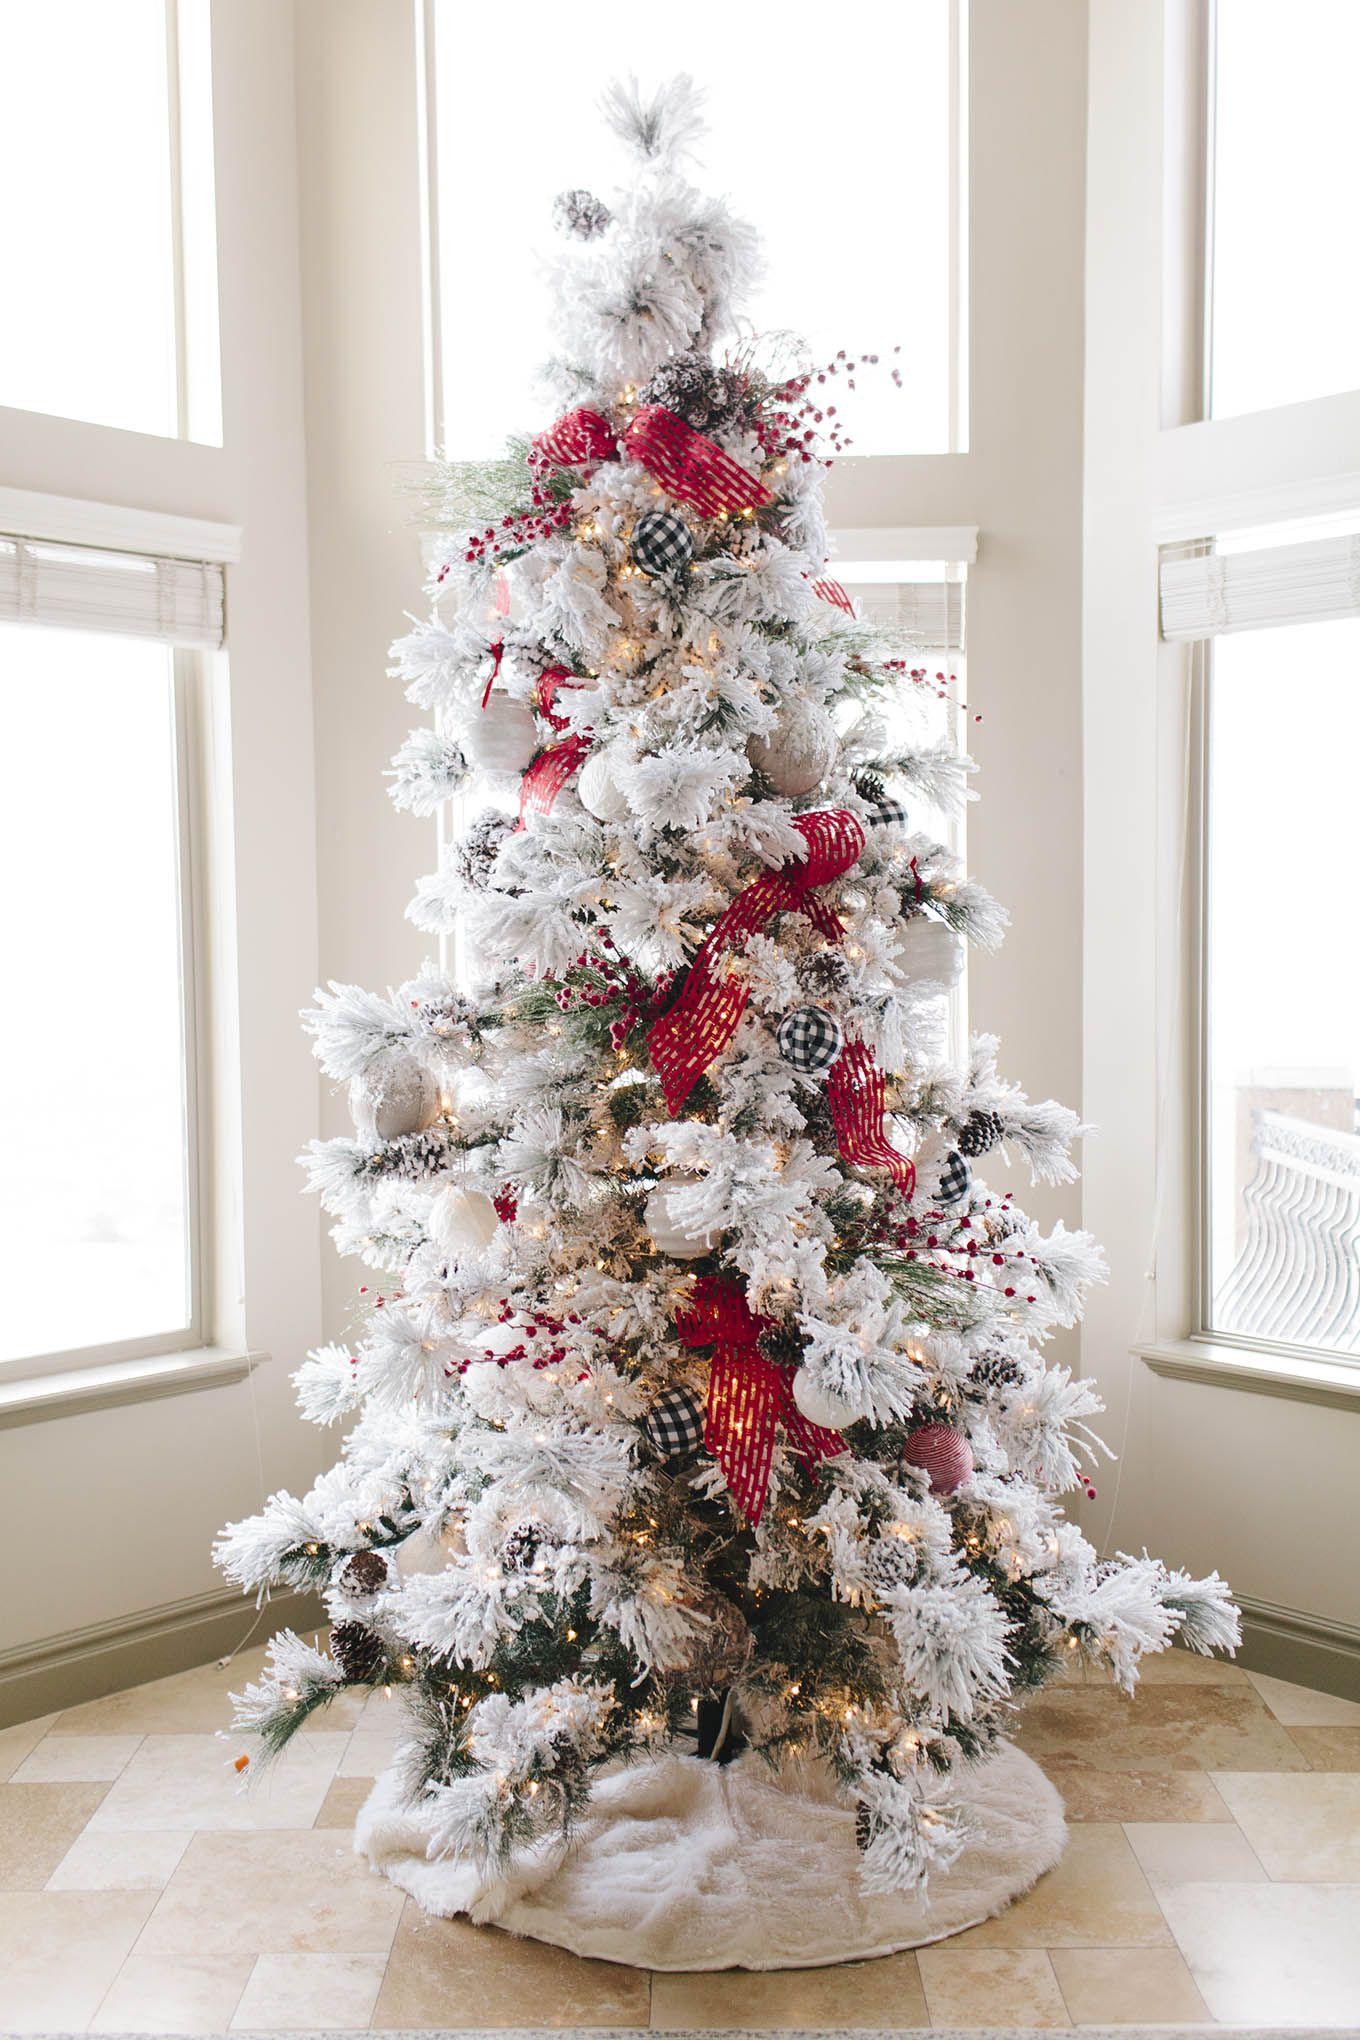 Home Holiday Decor Holiday Decor Fashion Christmas Tree Rustic